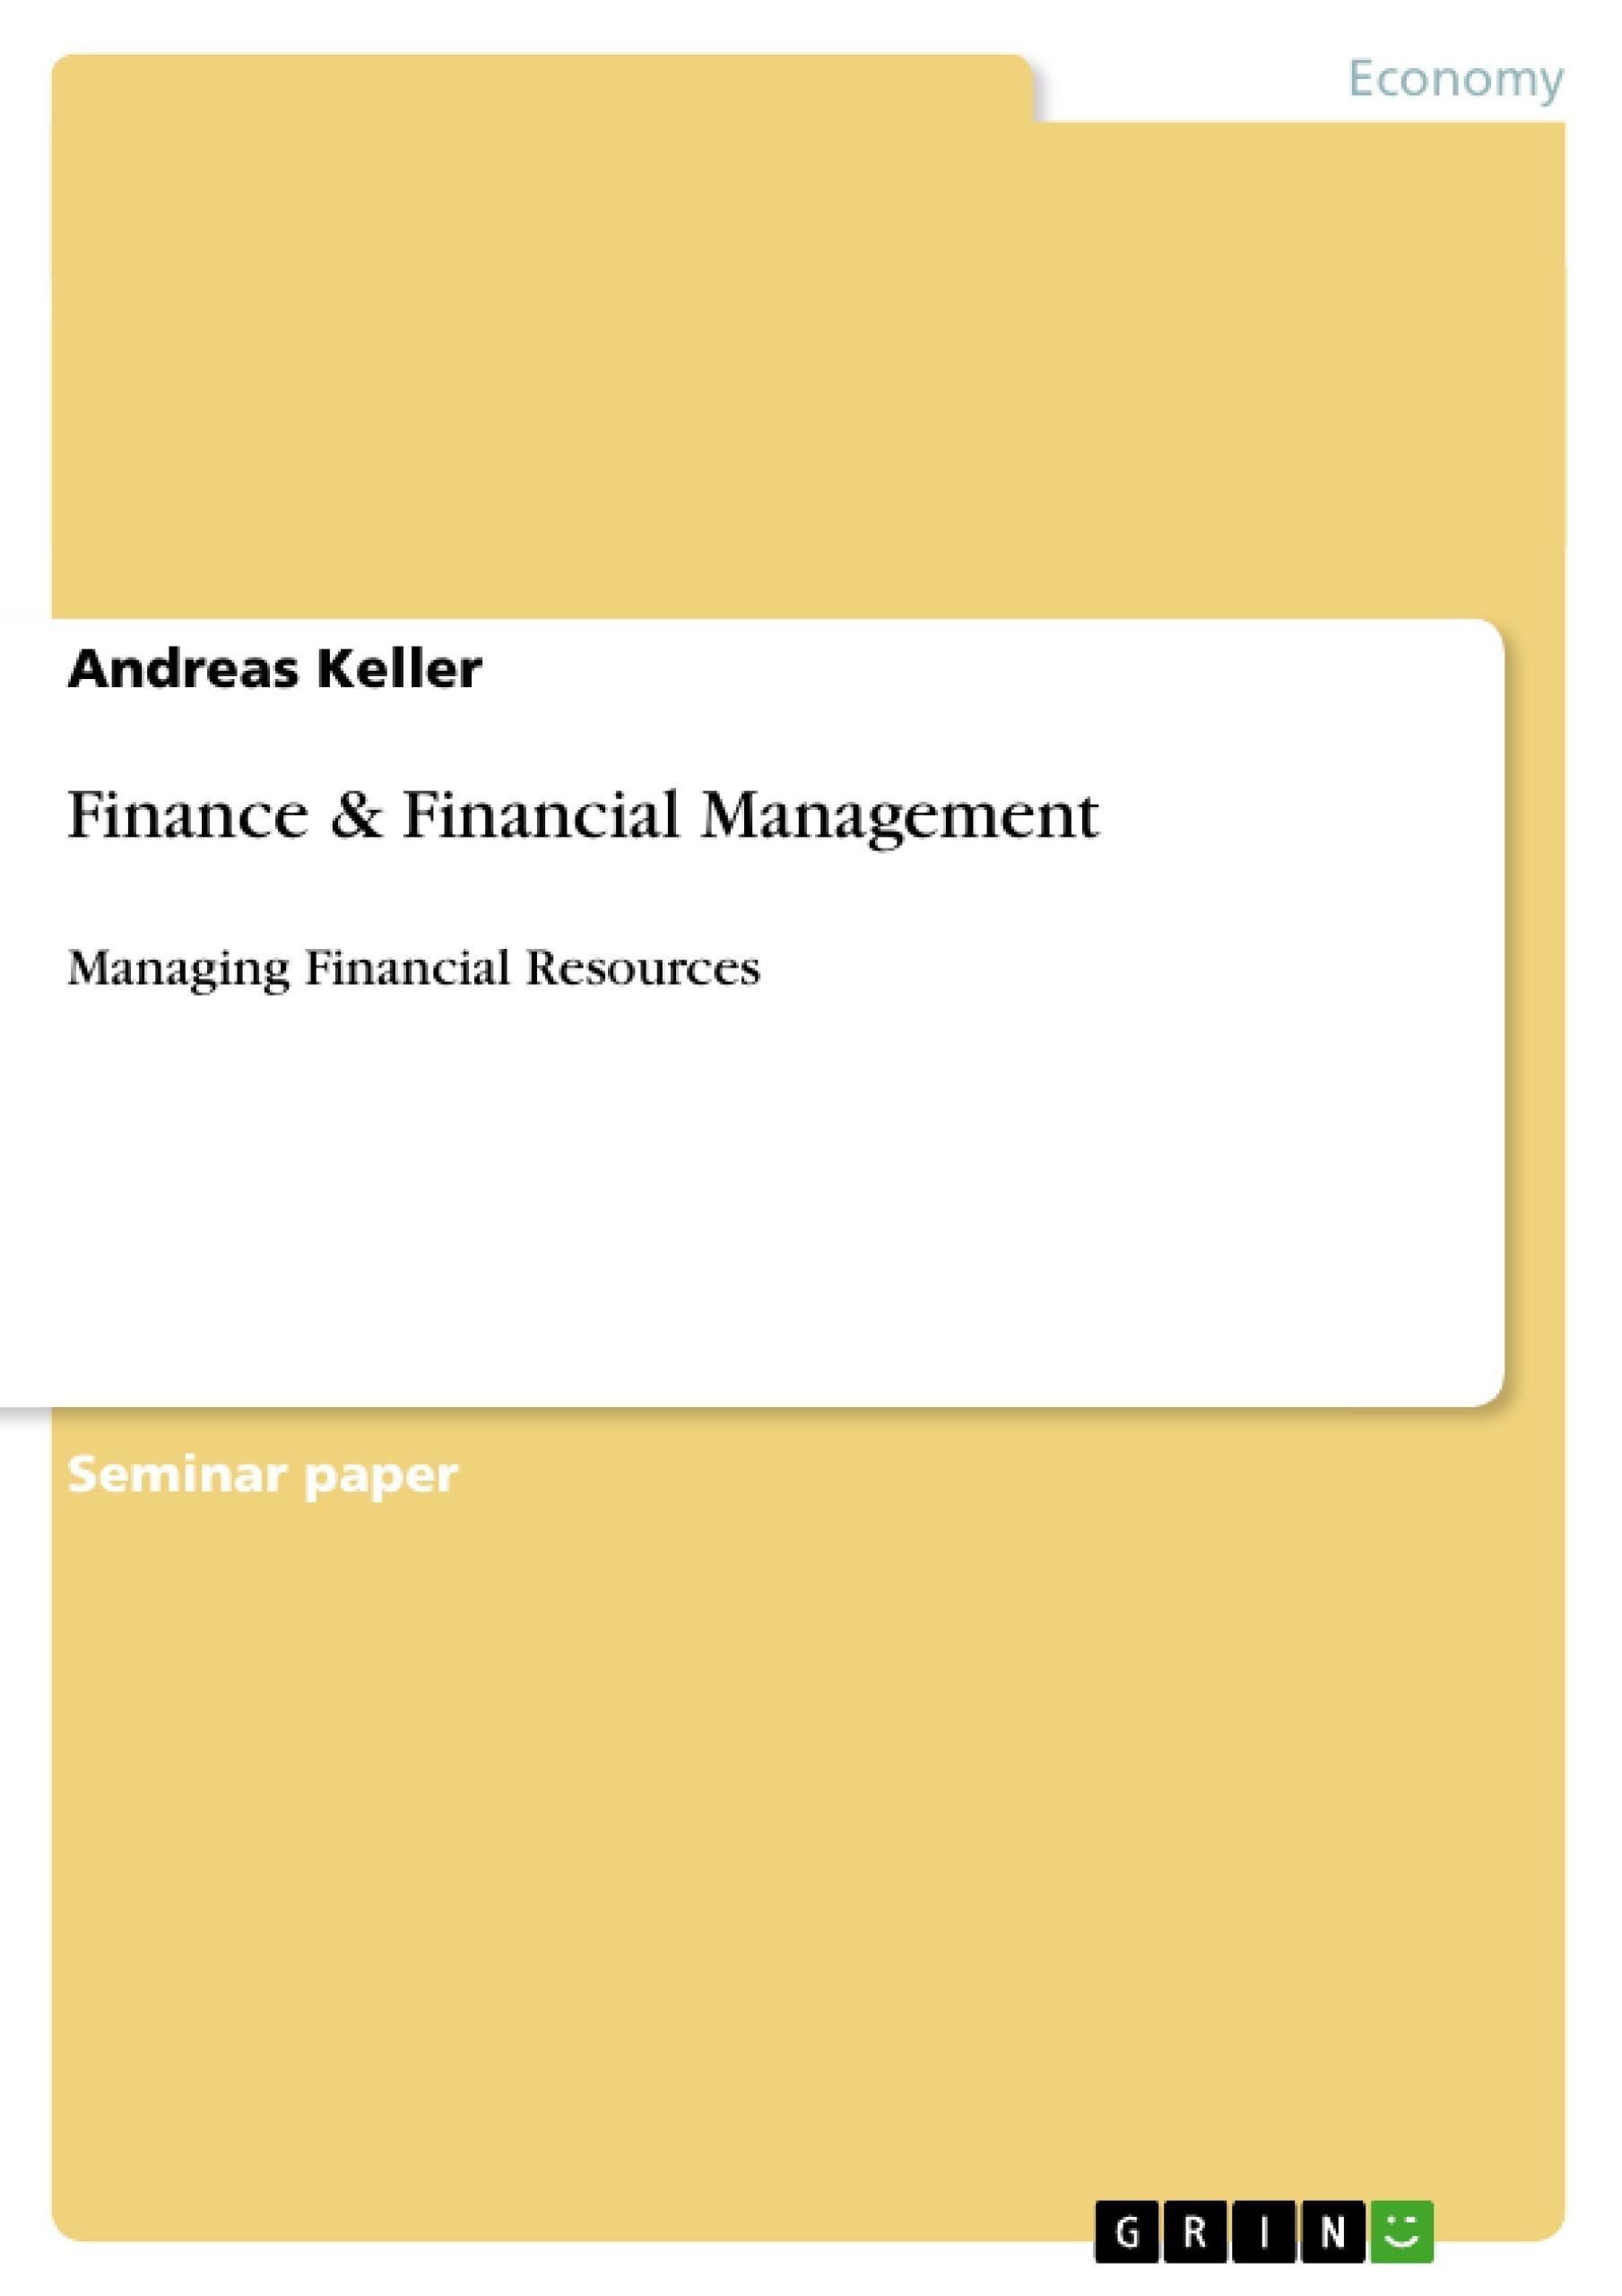 Title: Finance & Financial Management